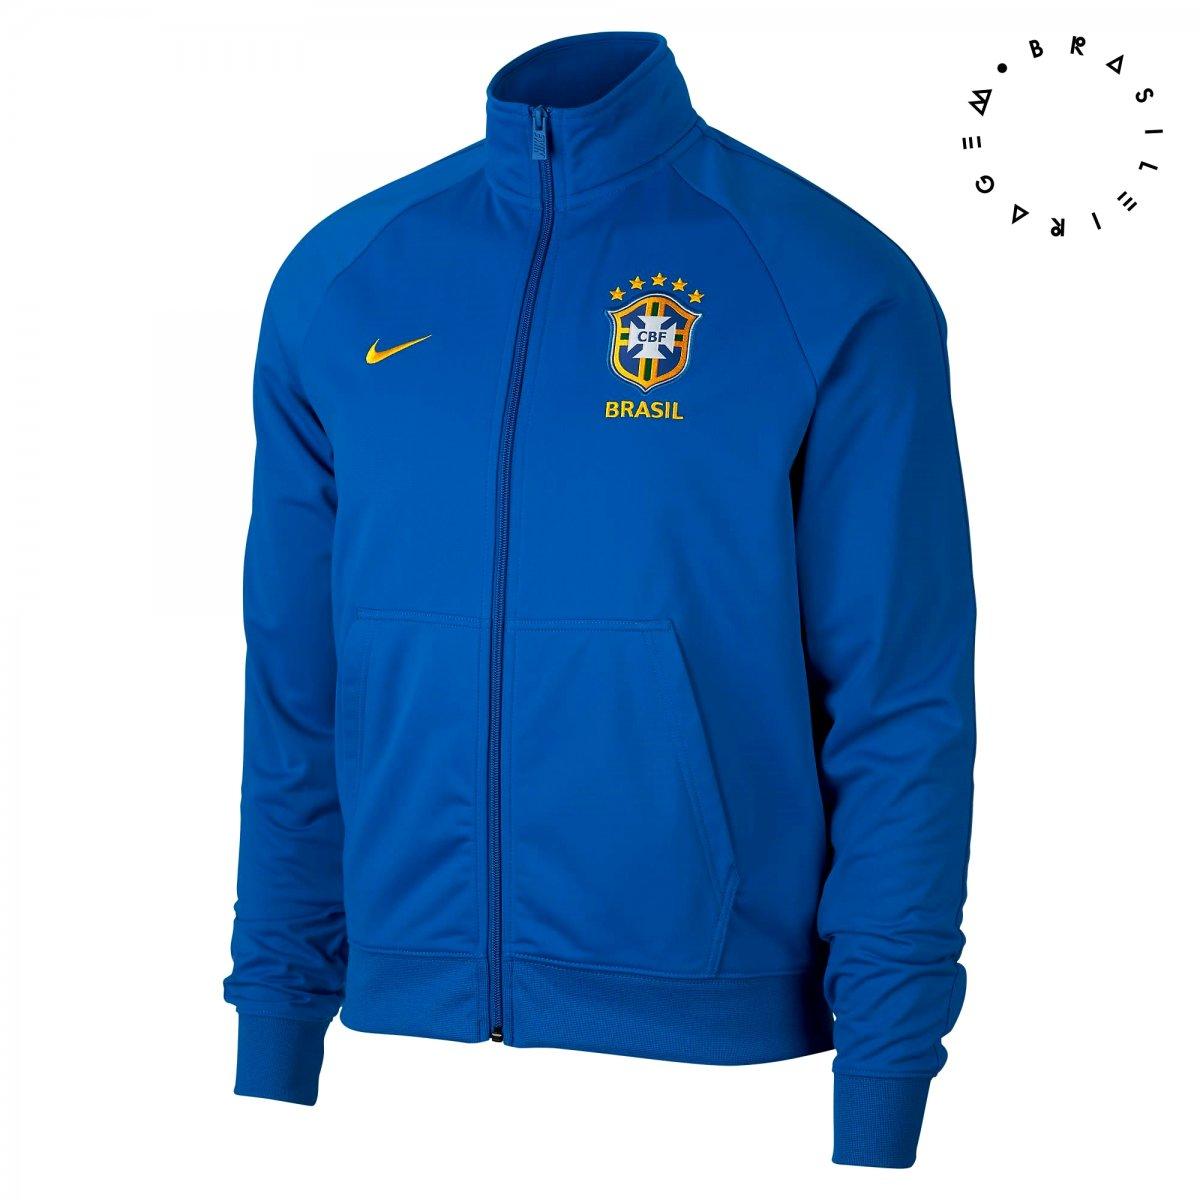 Jaqueta Masculina Nike Brasil CBF 891587-455 - Azul - Calçados ... 54c74be08bbc5